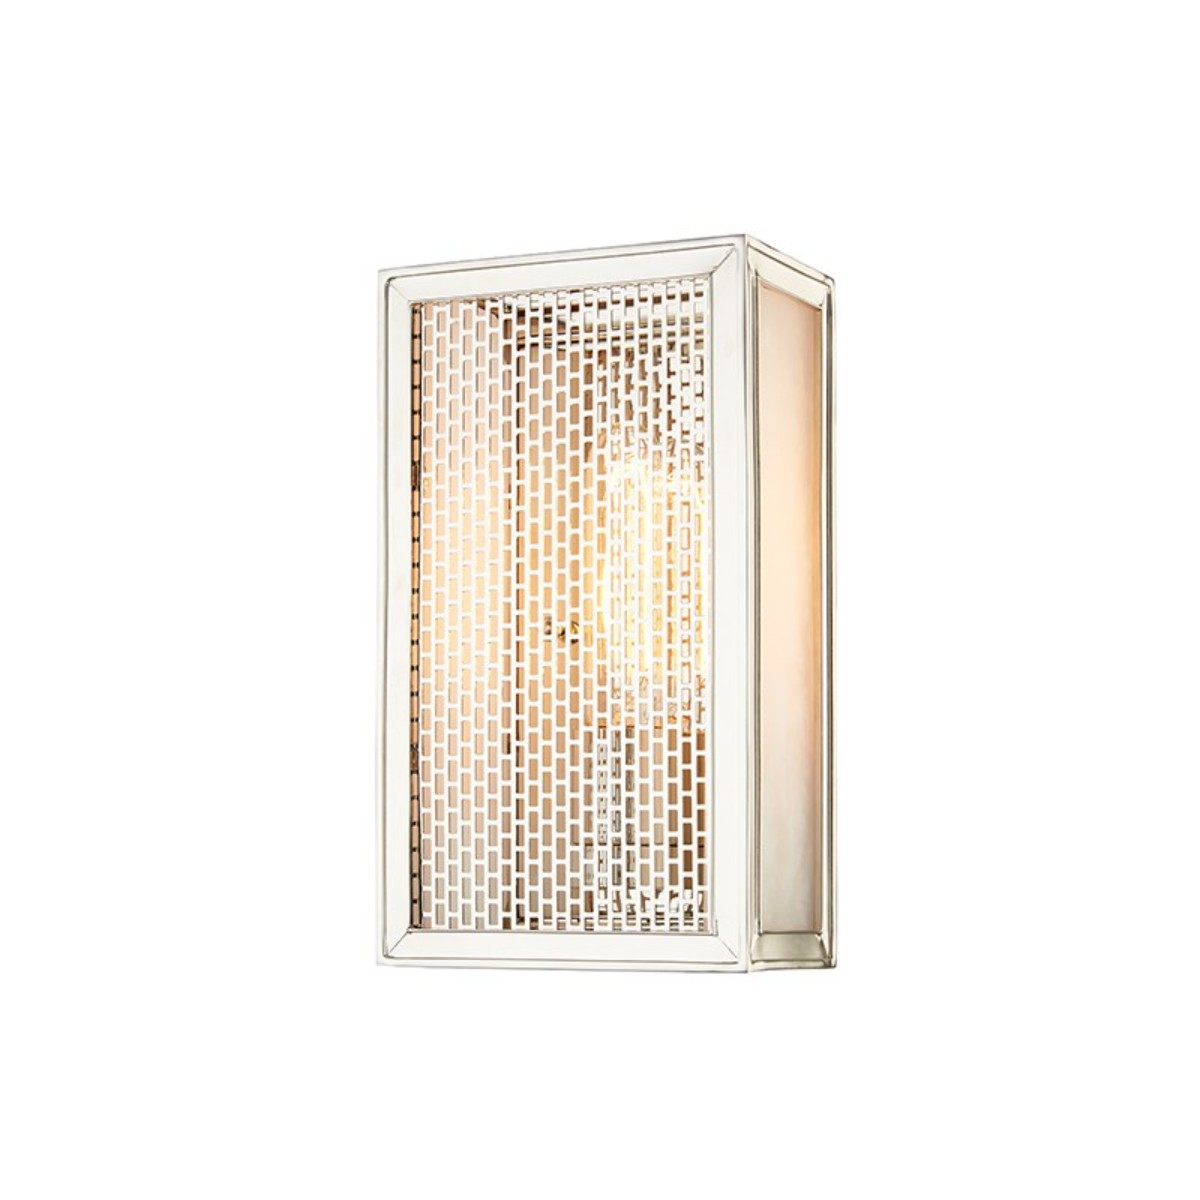 Hudson Valley | Ashford Wall Light | Polished Nickel